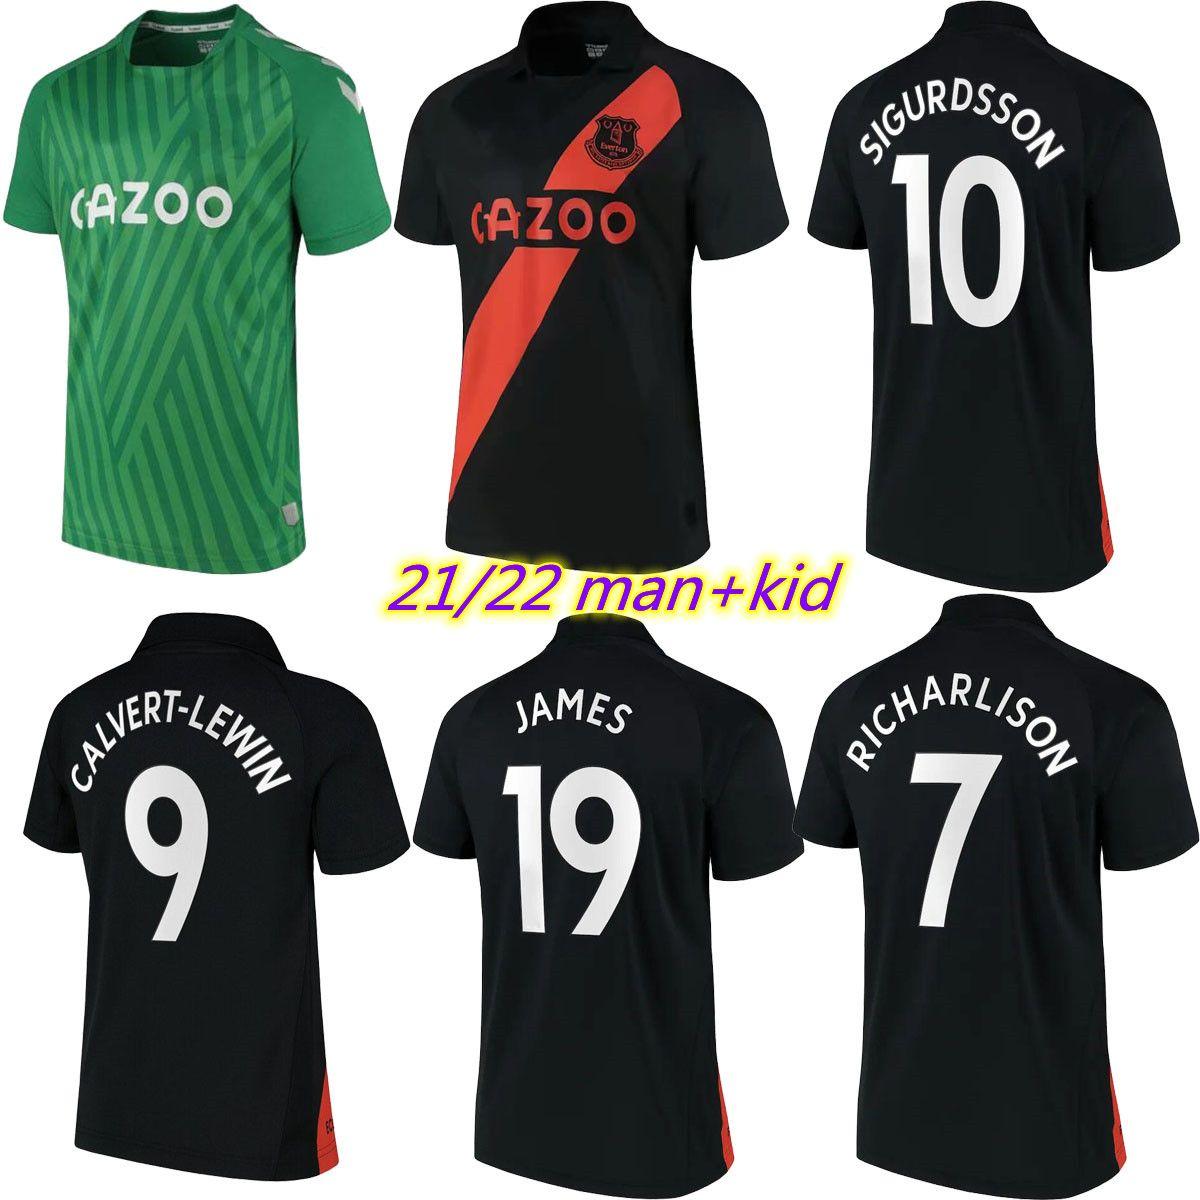 21 22 Calvert-Lewin Soccer Jerseys James Richarlison 2021 2022 Digne Sigurdsson Camisa de Futebol Doucoure Bernard Men + Kids Kit